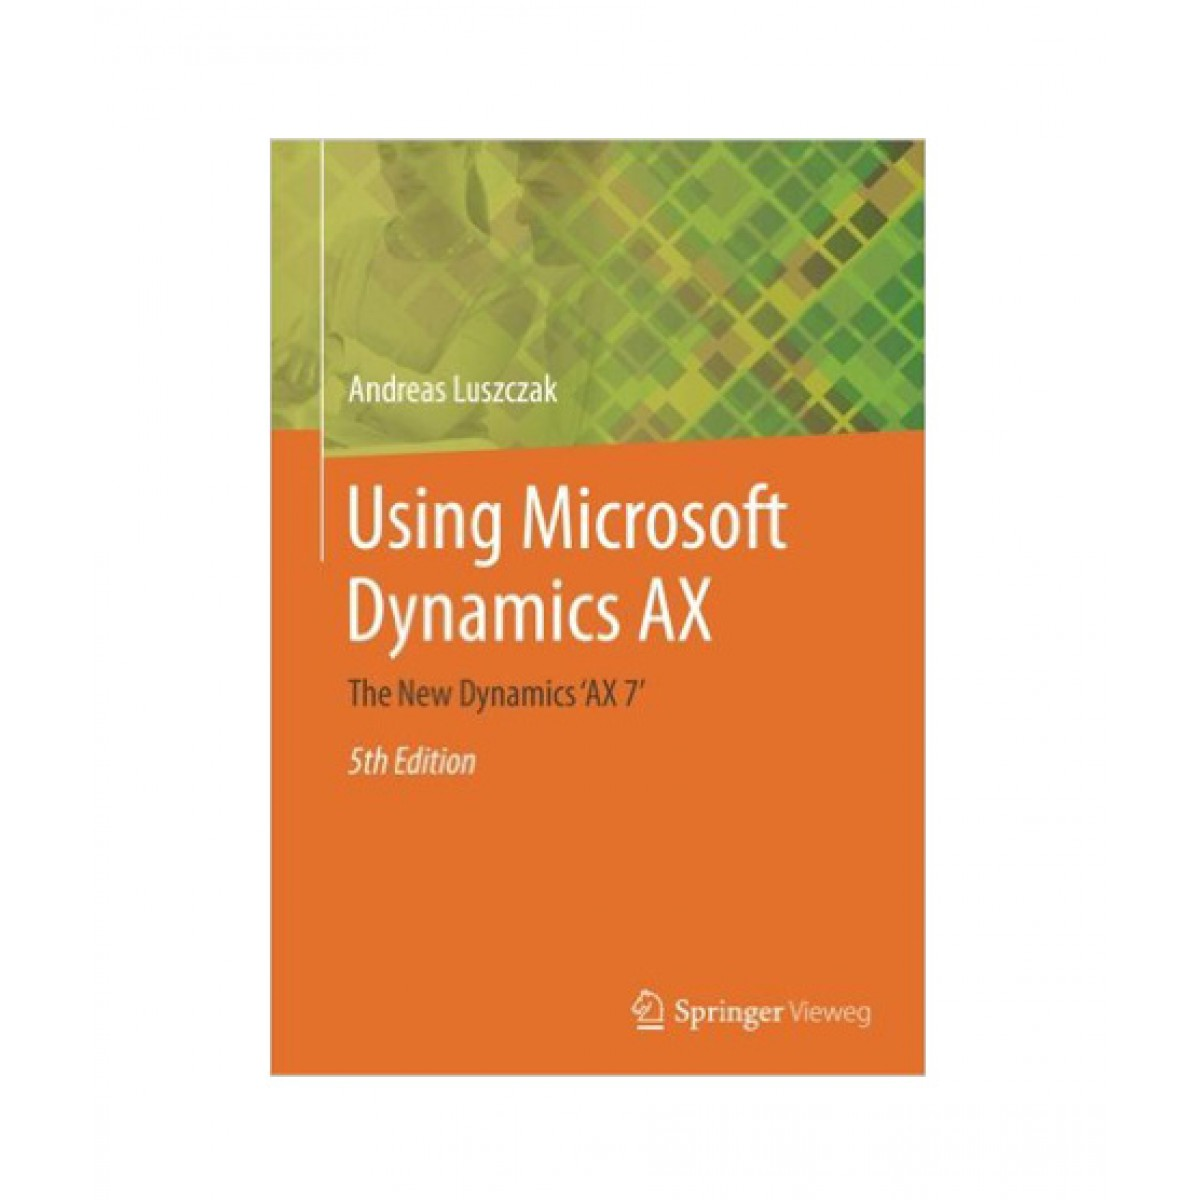 Using Microsoft Dynamics AX Book 5th Edition